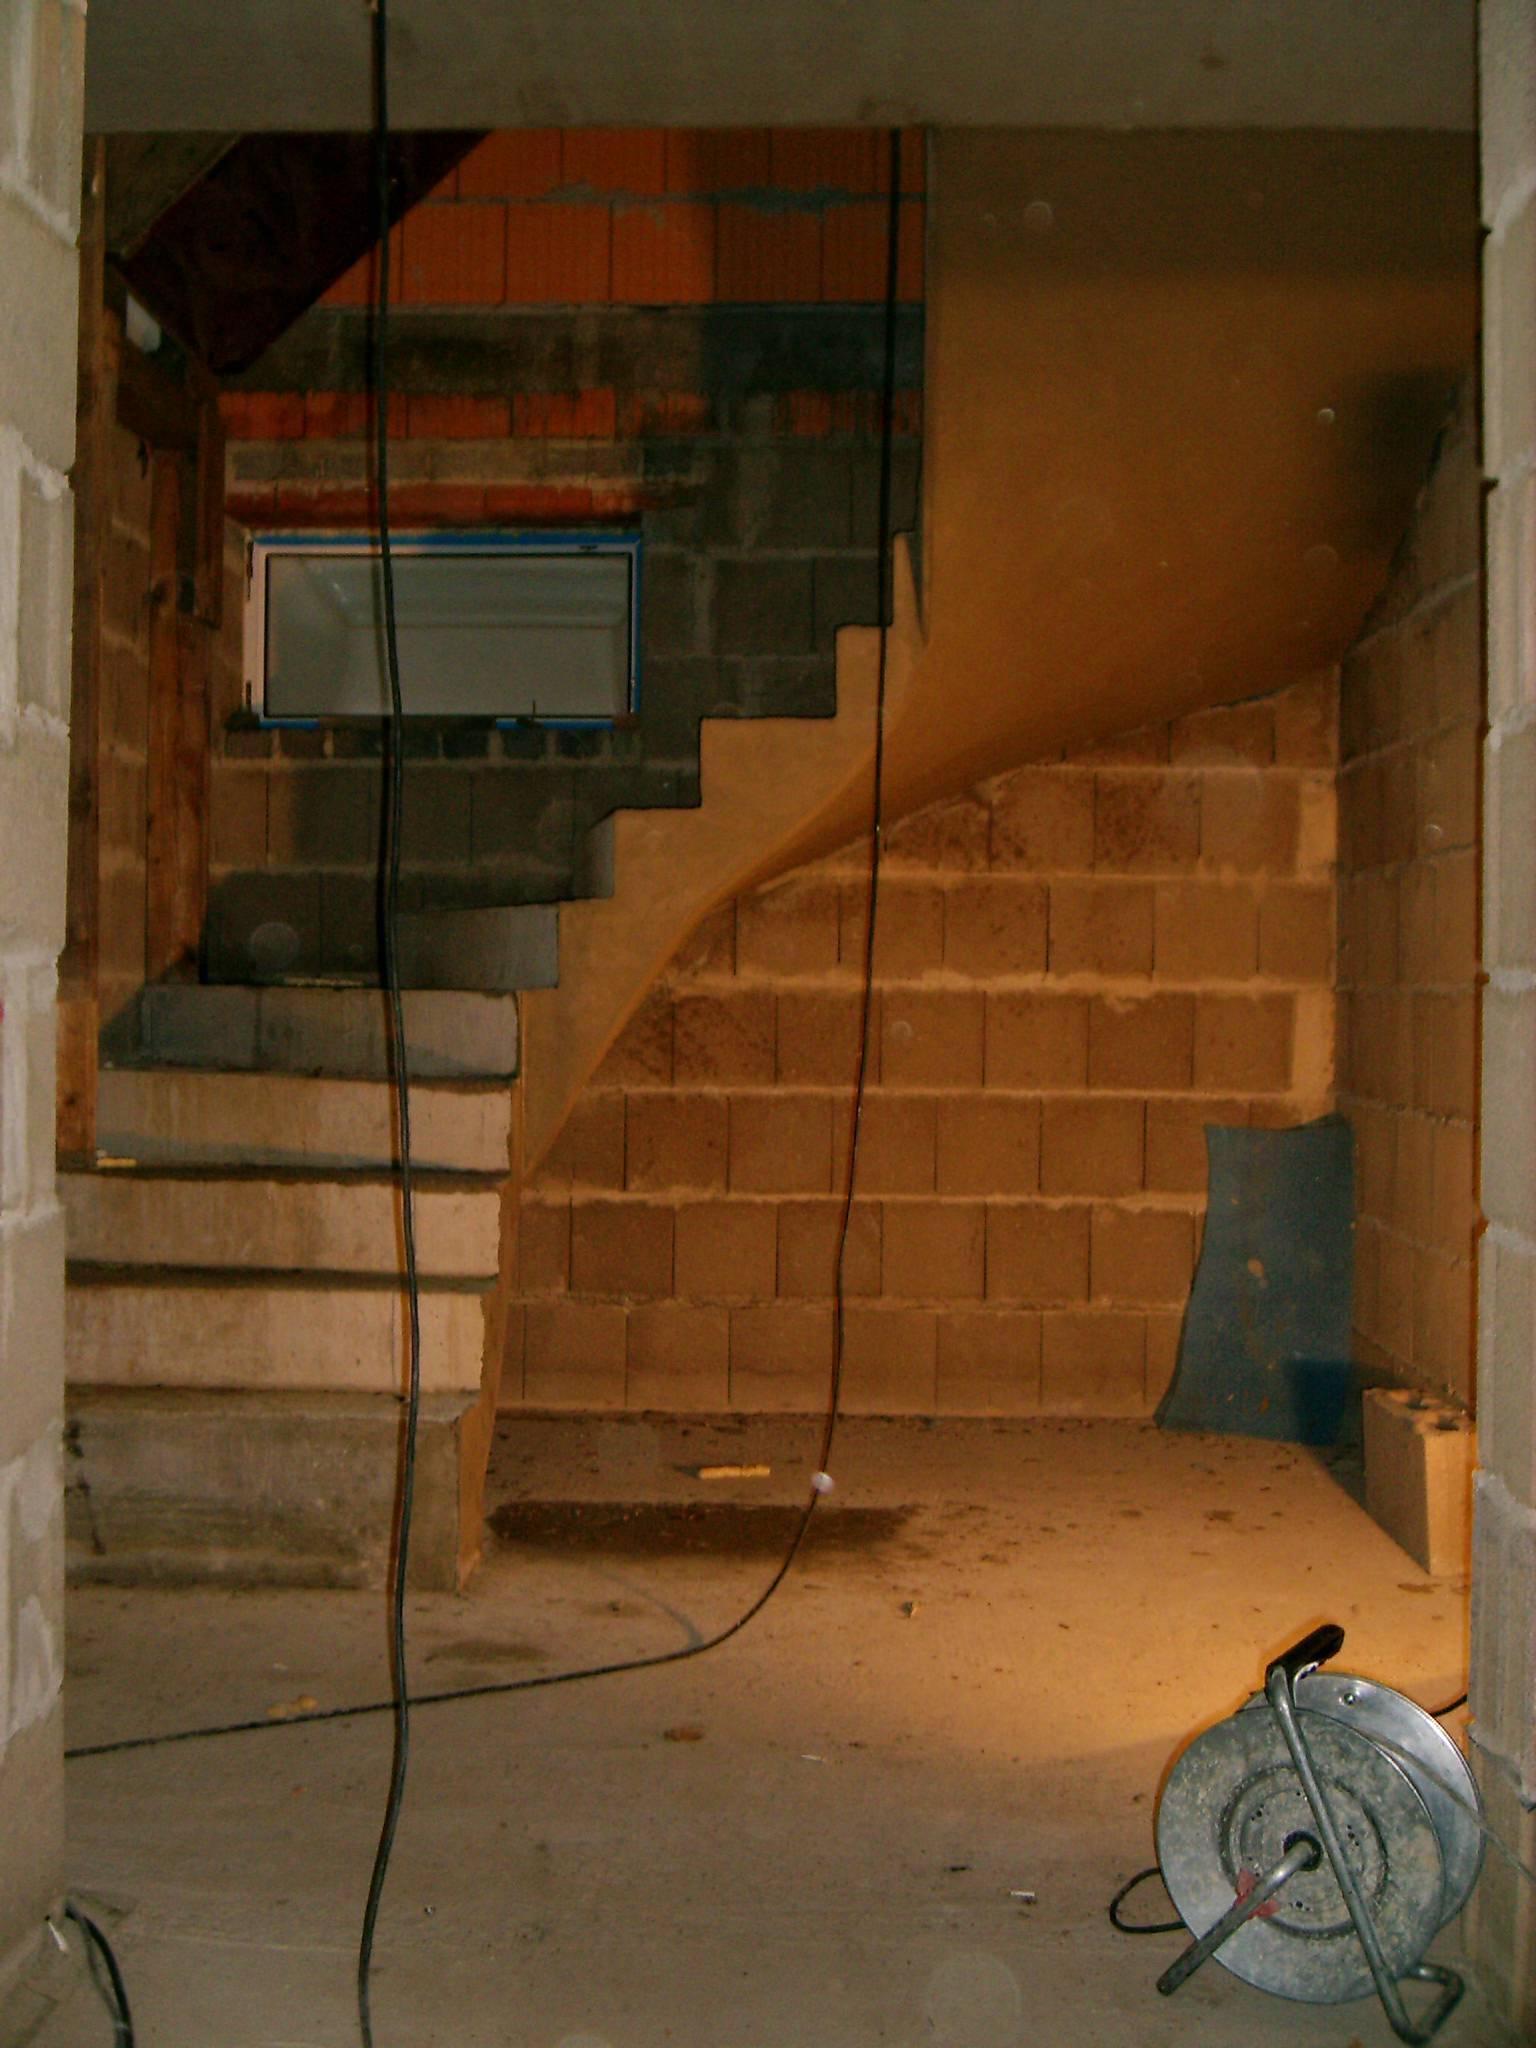 gescho treppen baubetrieb norbert kubasch treppenbau mit. Black Bedroom Furniture Sets. Home Design Ideas